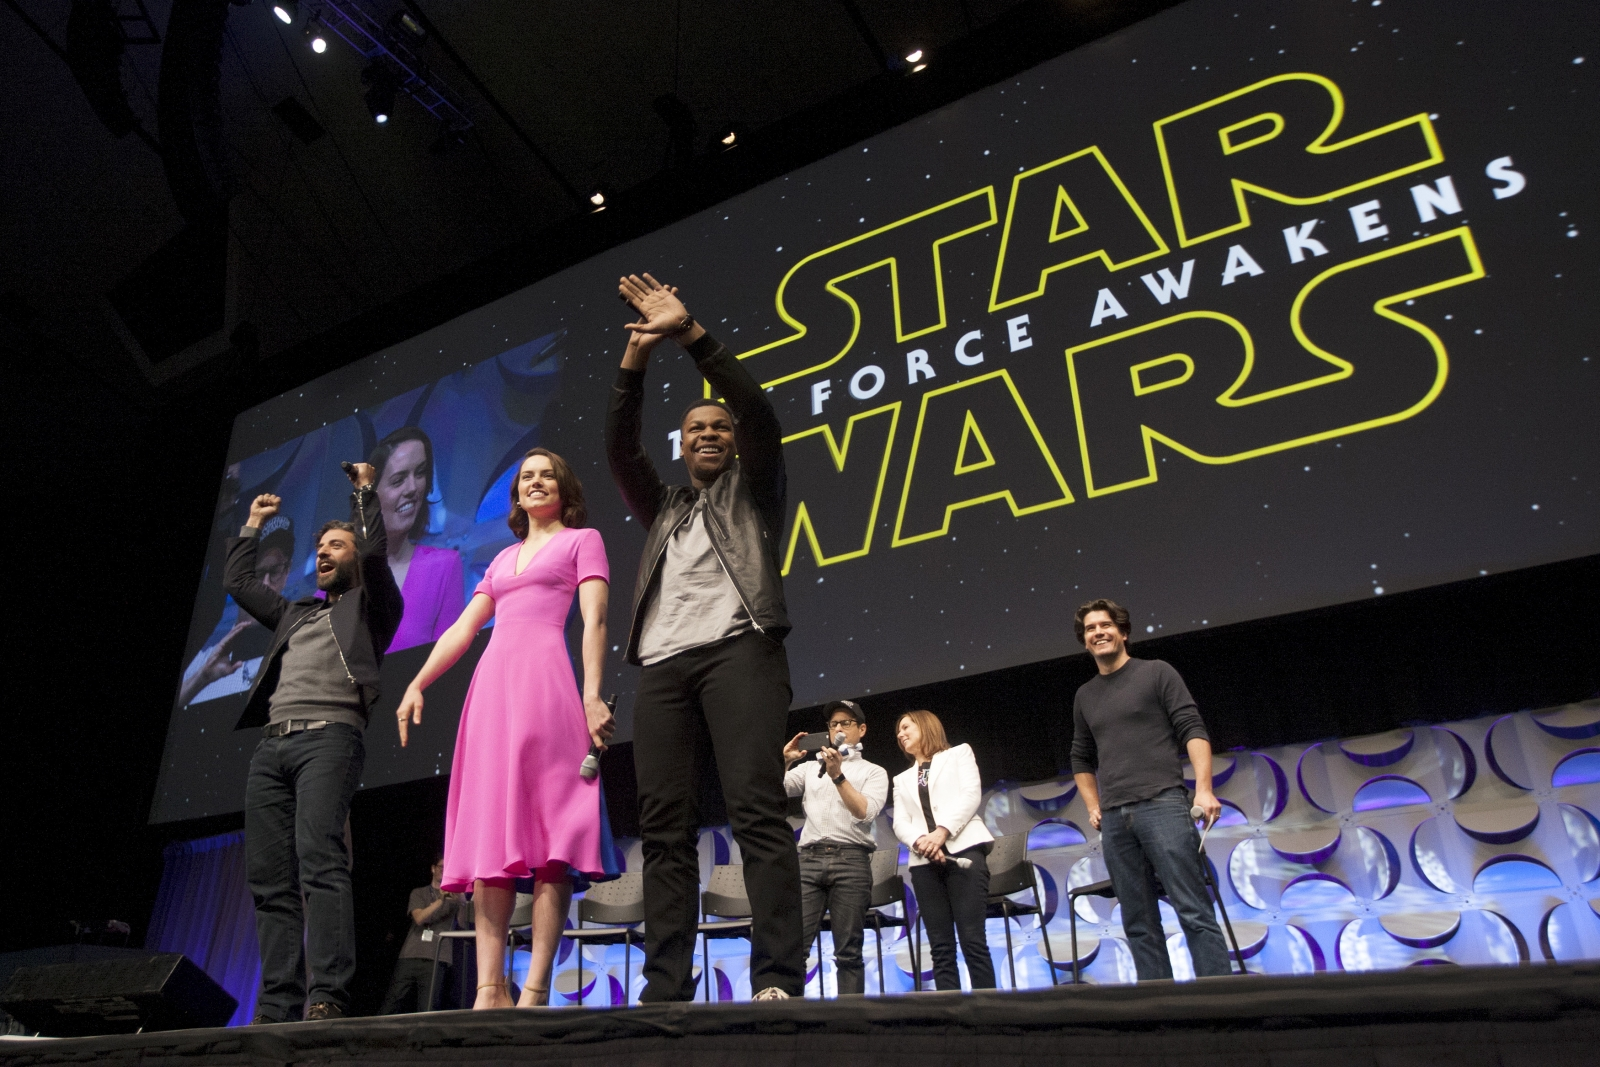 Star Wars: The Force Awakens cast